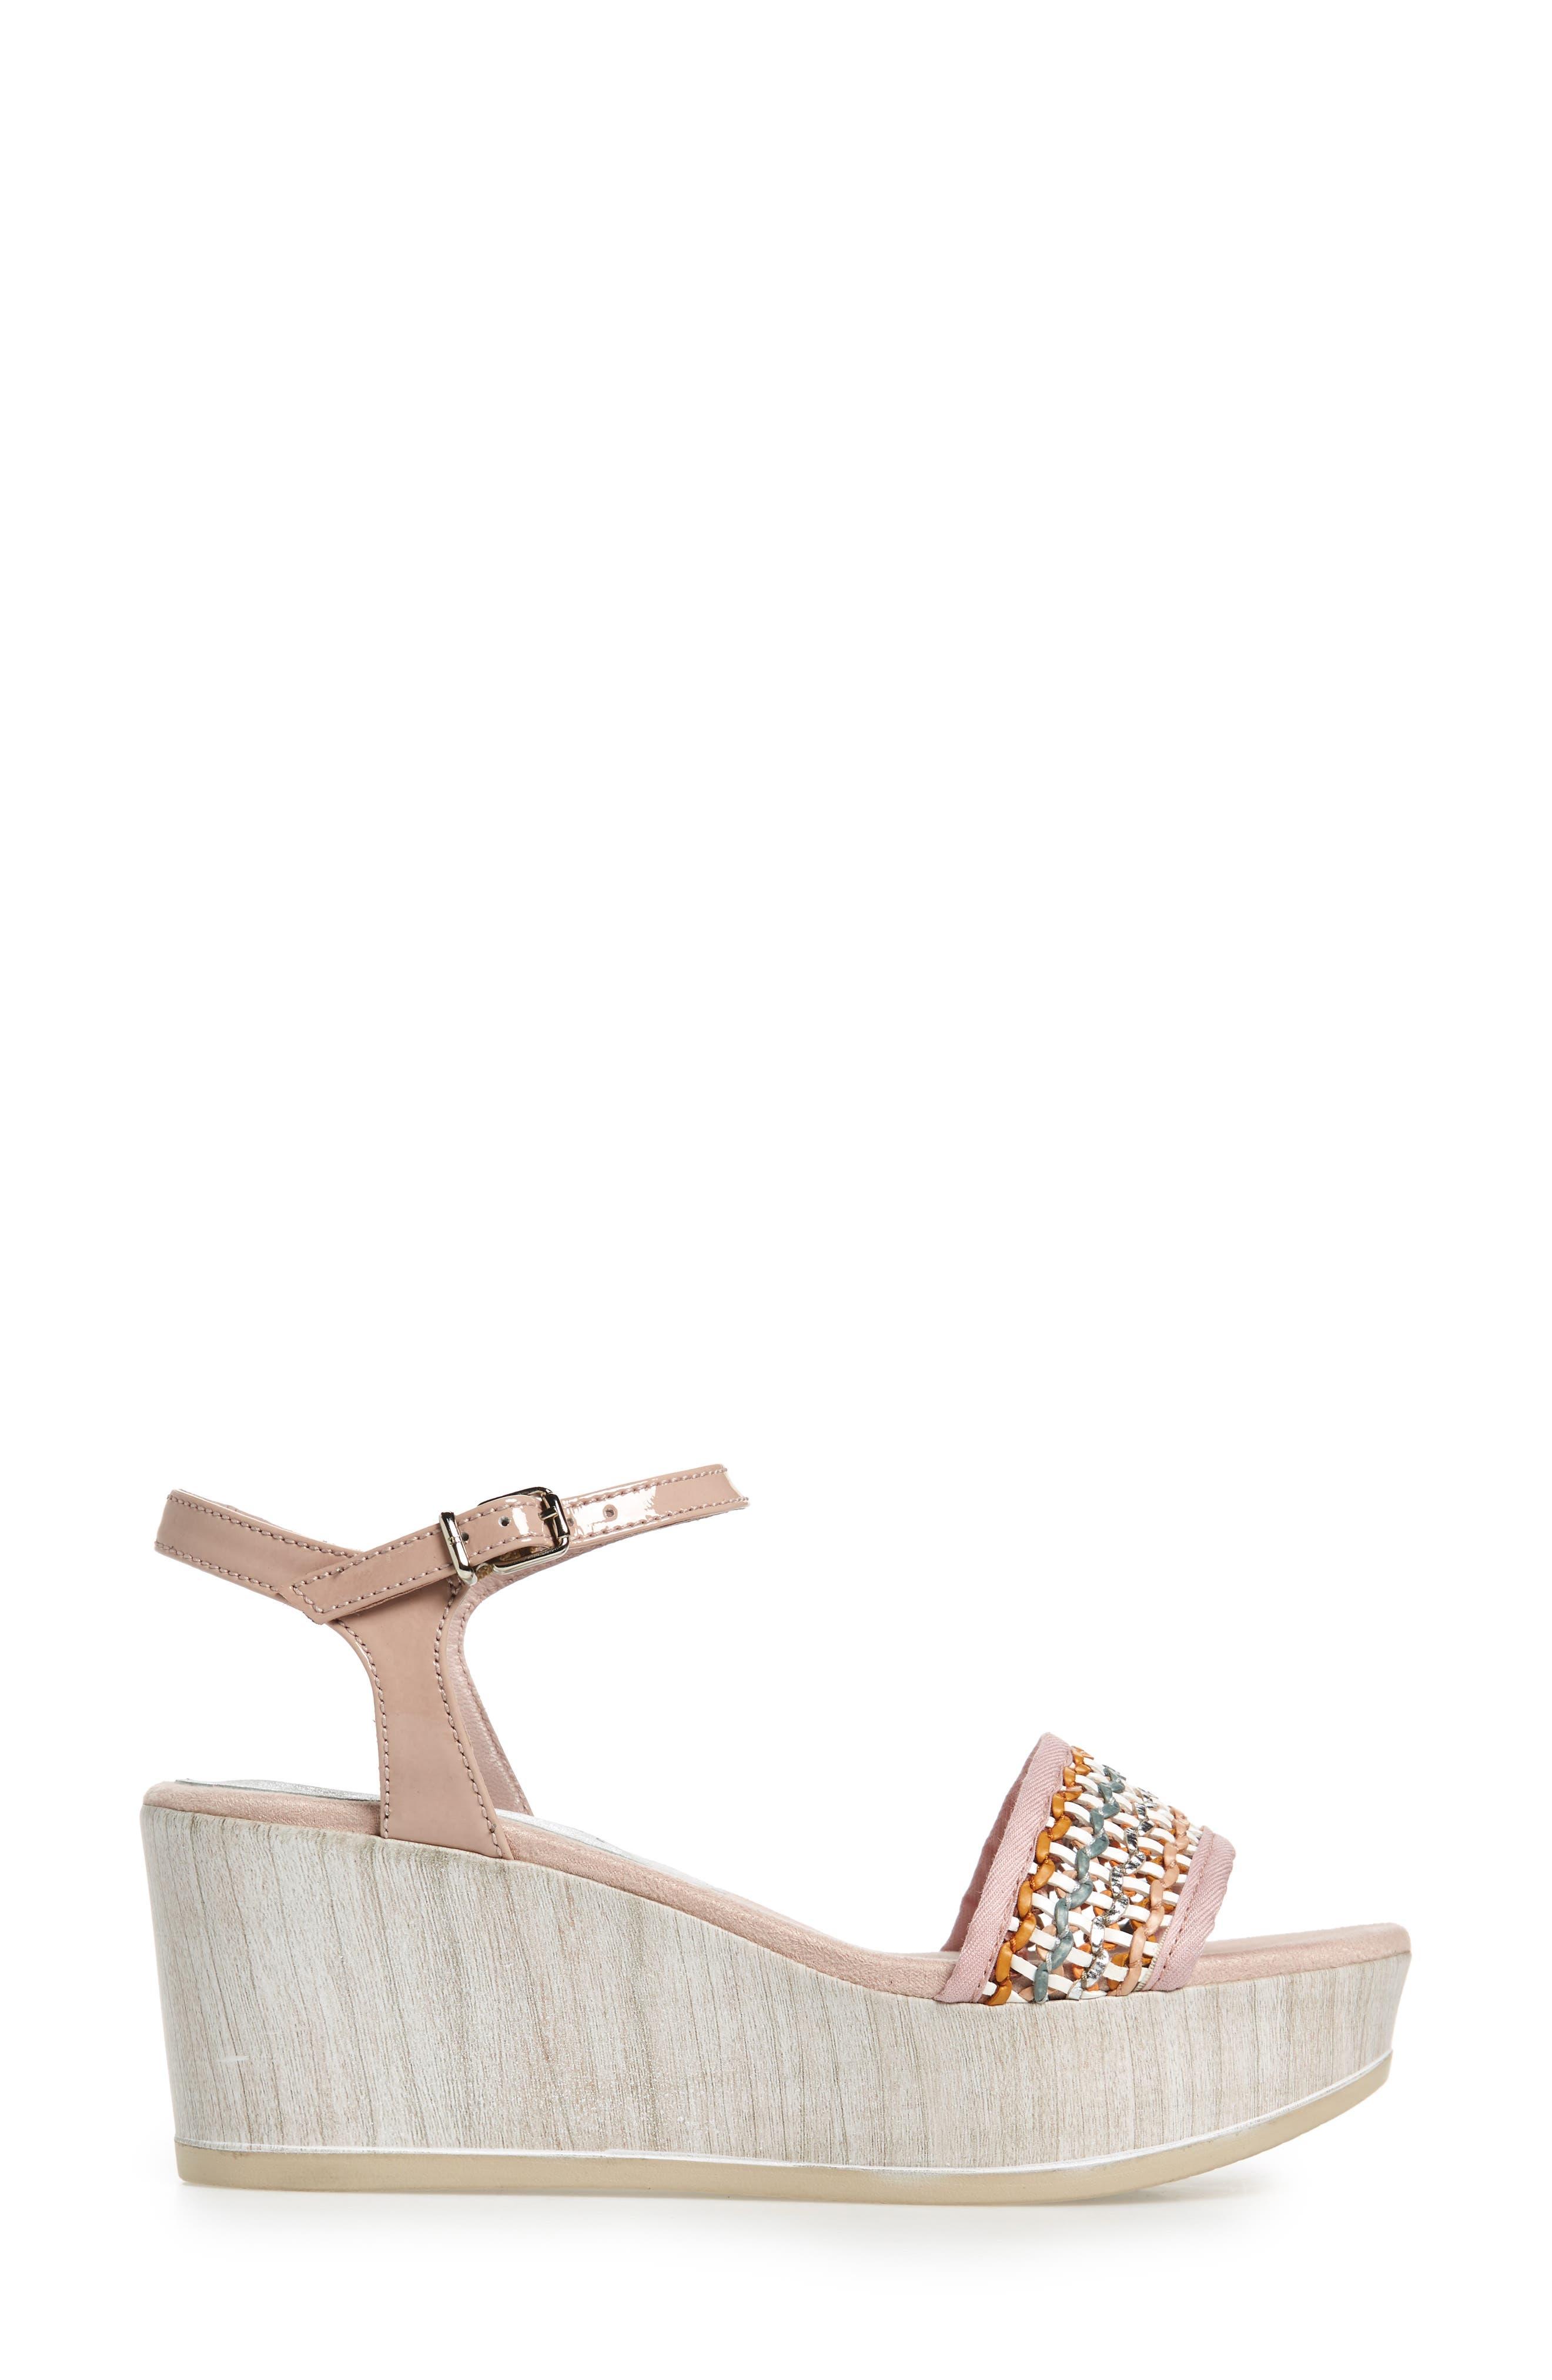 Colbi Platform Wedge Sandal,                             Alternate thumbnail 3, color,                             Amalfittana Leather